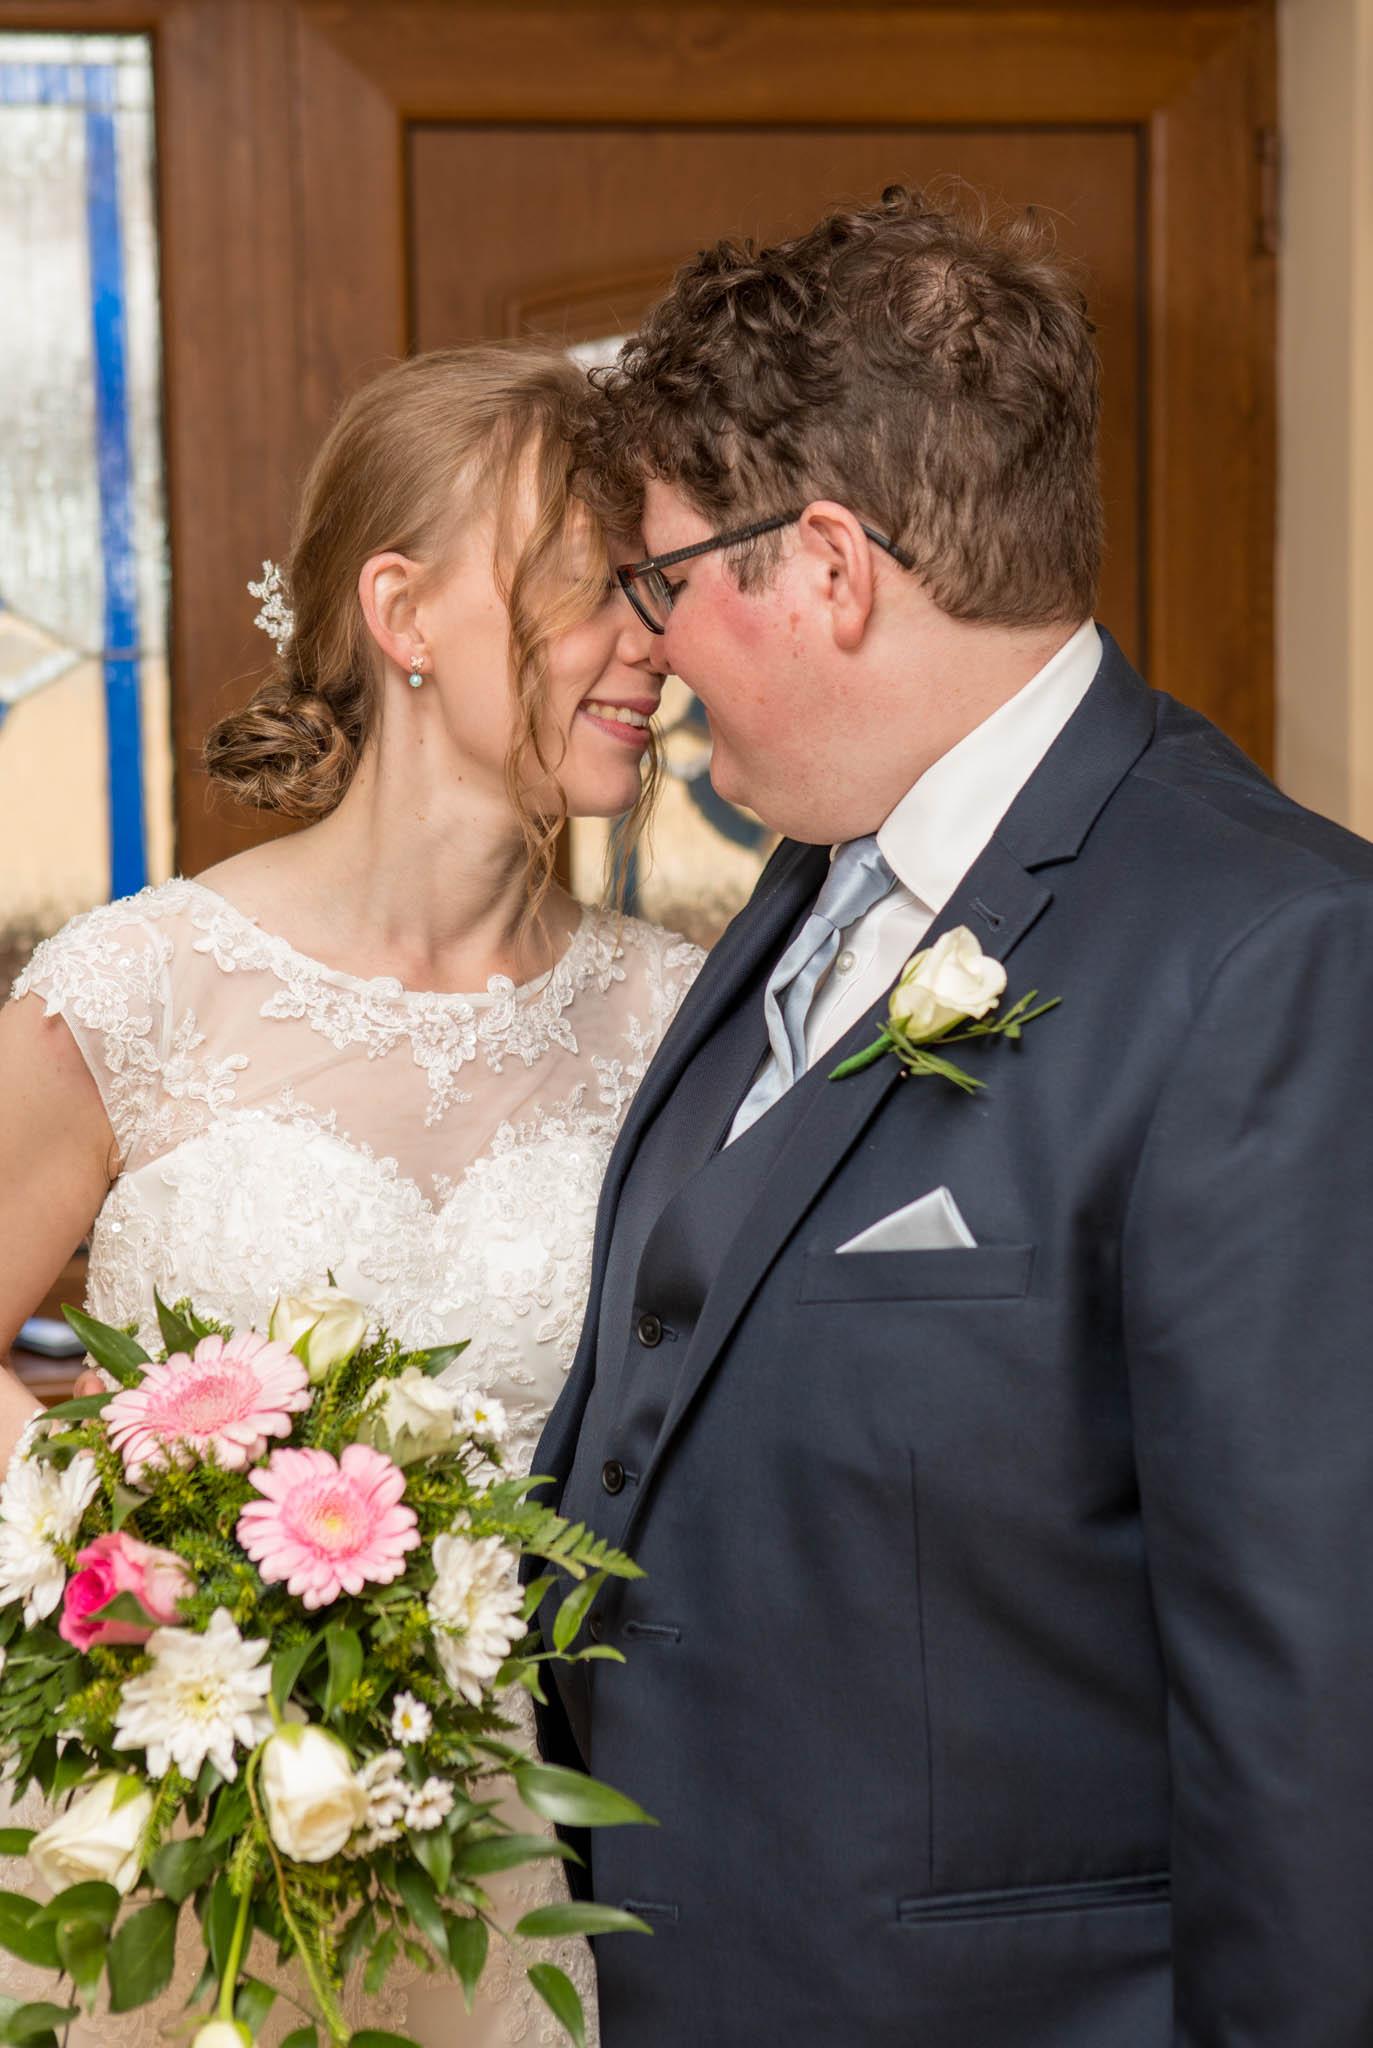 Wedding of Oli & Kate, Caer Beris Hotel Builth Wells, Tania Miler Photography